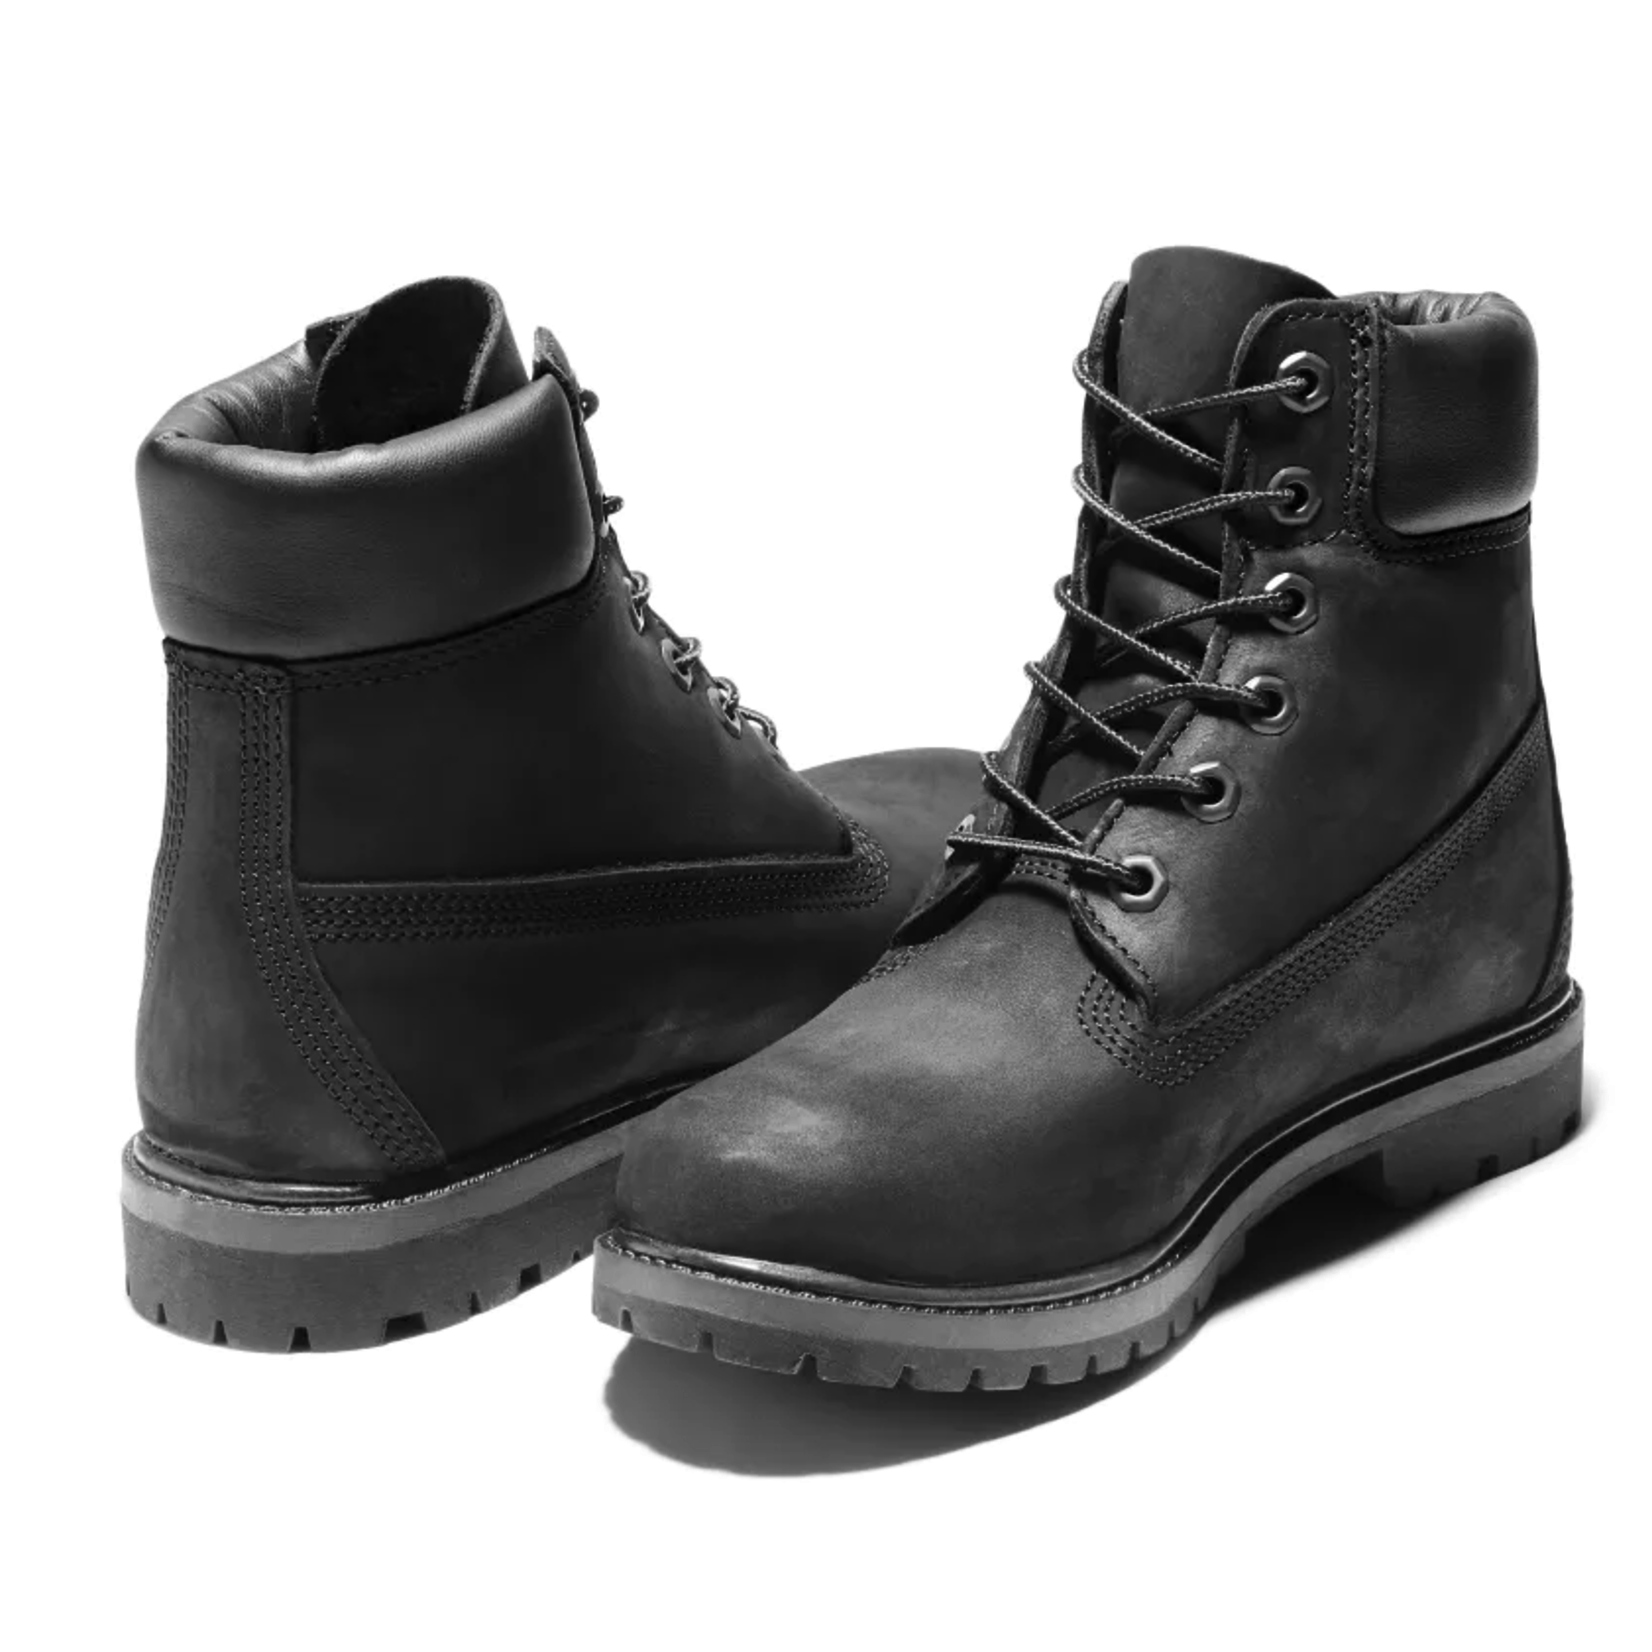 "Timberland Timberland Women's Premium 6"" Waterproof Boots - Black - 08658A 001"